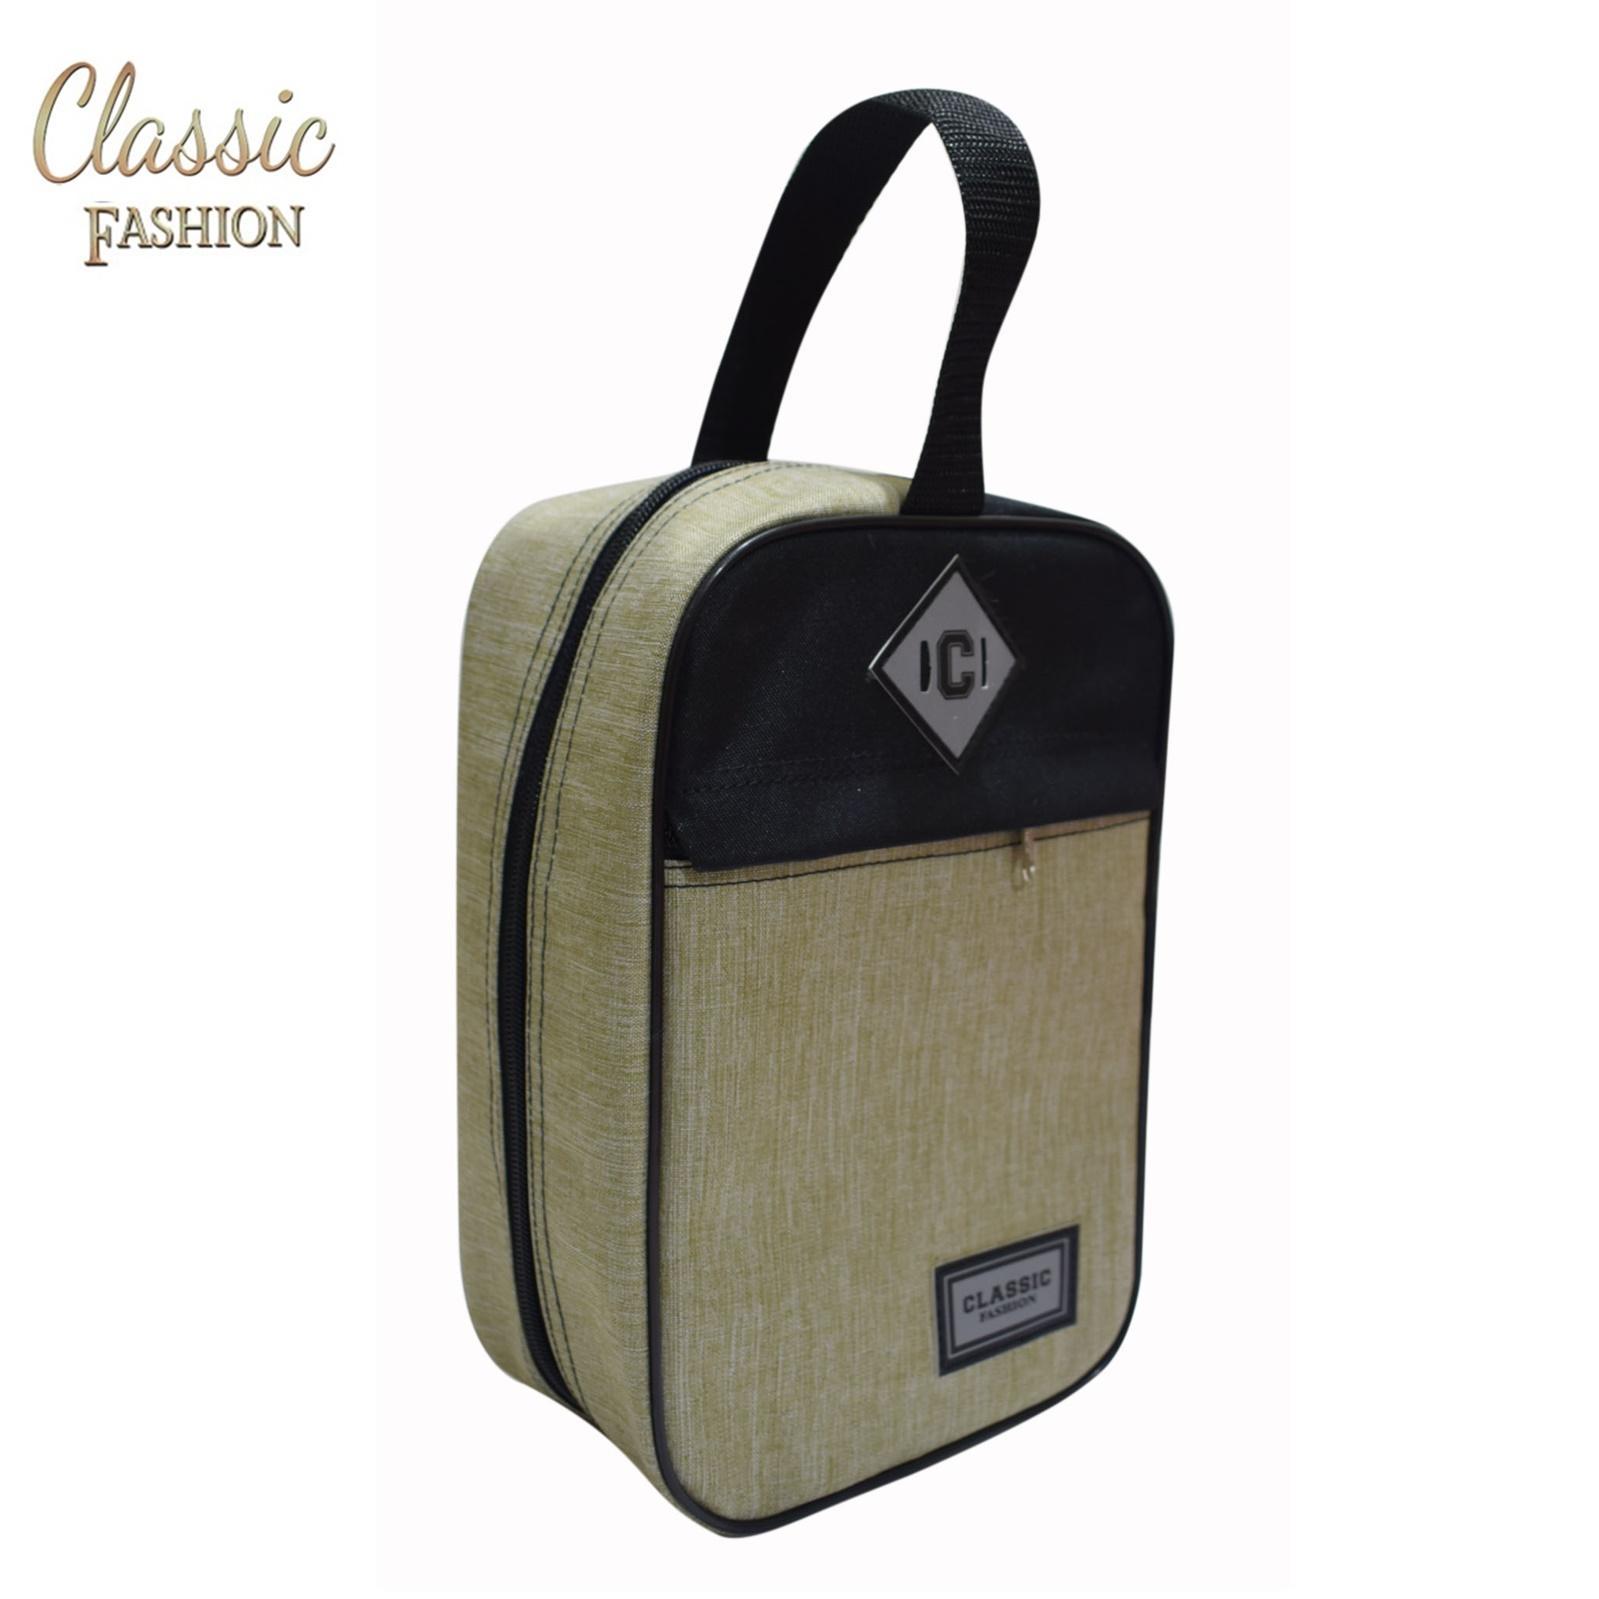 Duffle Bag for Men for sale - Mens Duffle Bag online brands 522186ae1ee6f